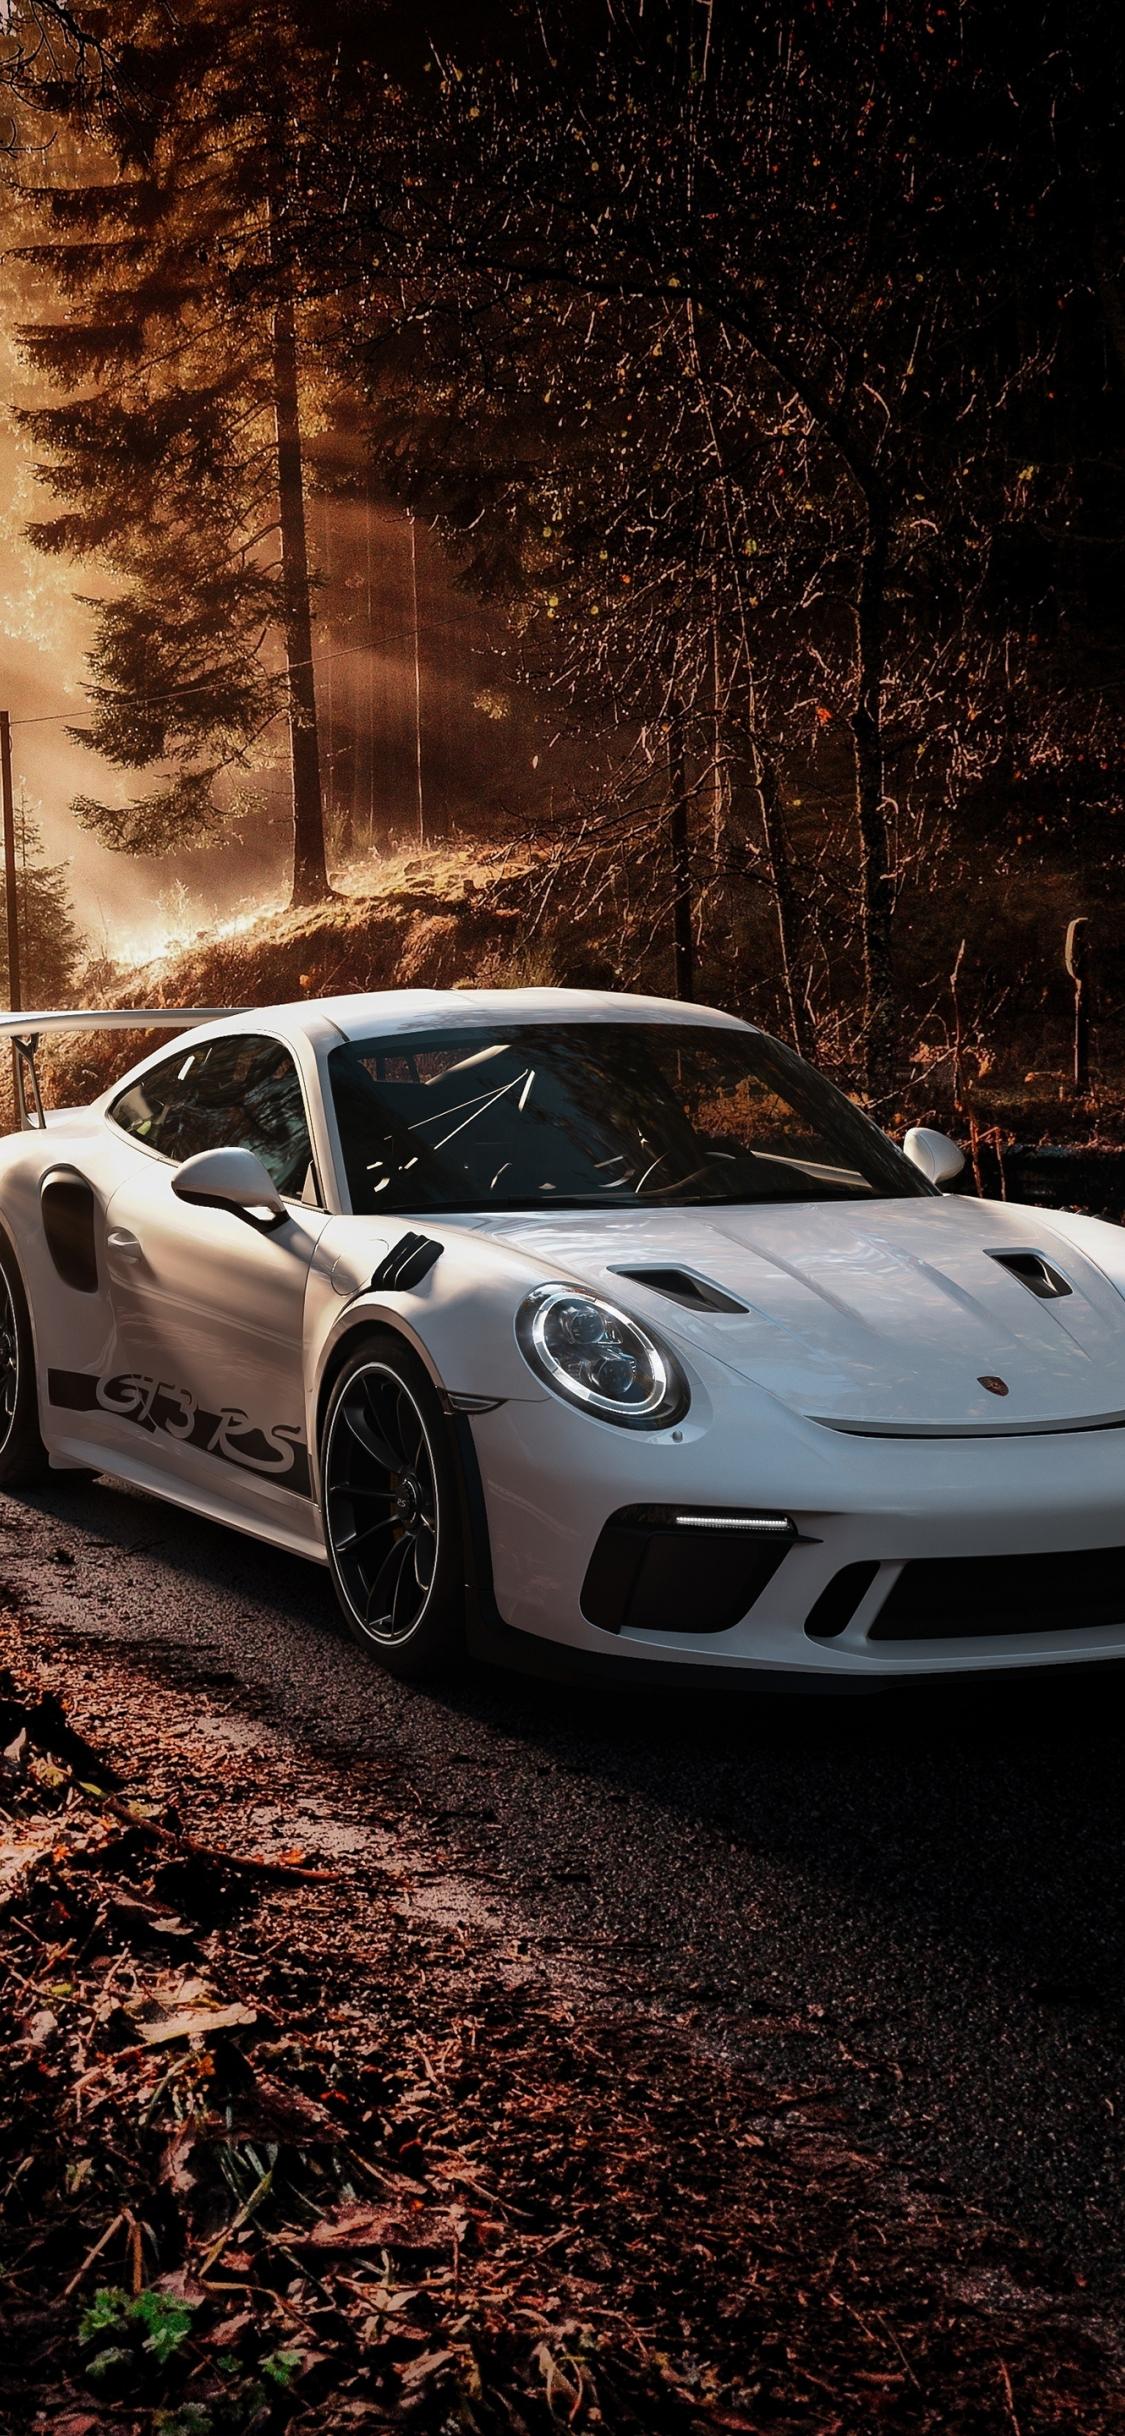 Download 1125x2436 Wallpaper Porsche 911 Gt3 Rs 2019 Iphone X